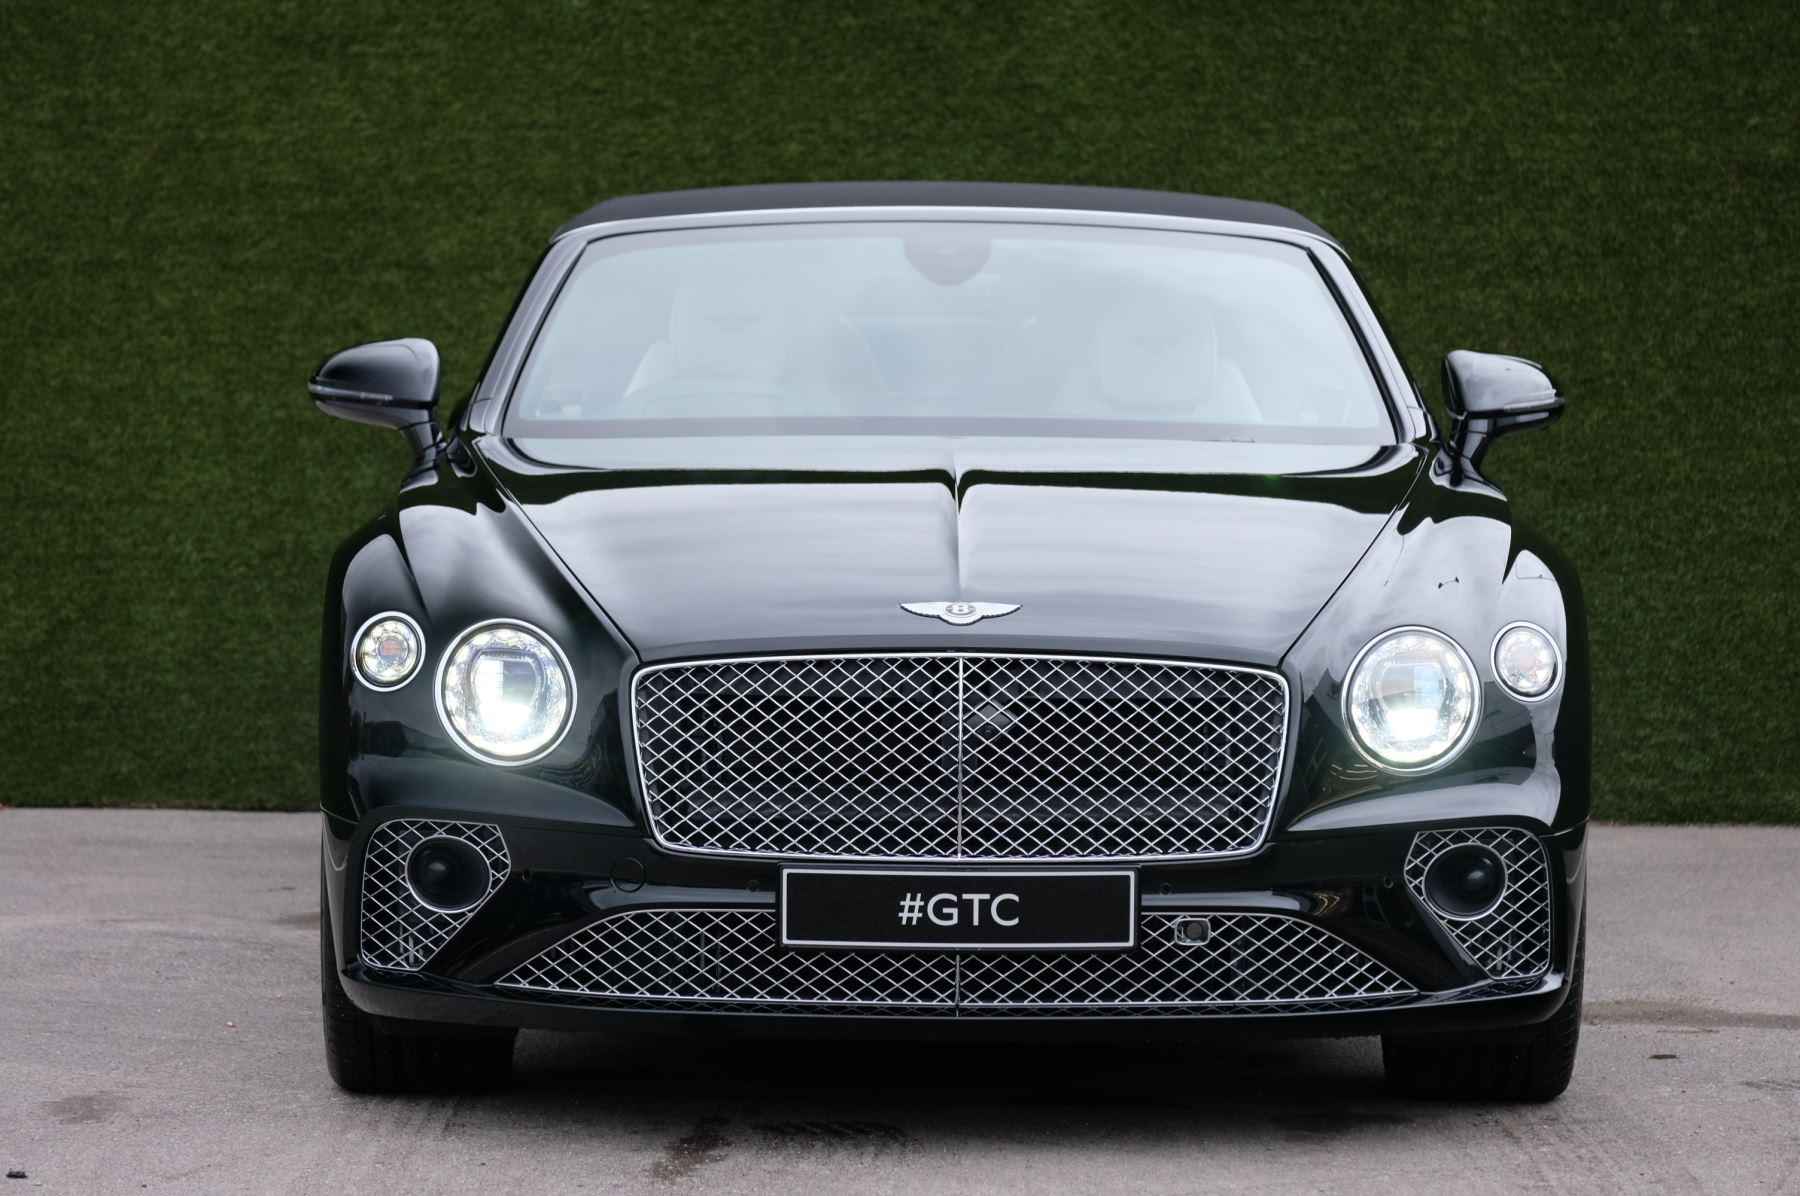 Bentley Continental GTC 4.0 V8 Mulliner Driving Spec 2dr Auto [Tour Spec] image 2